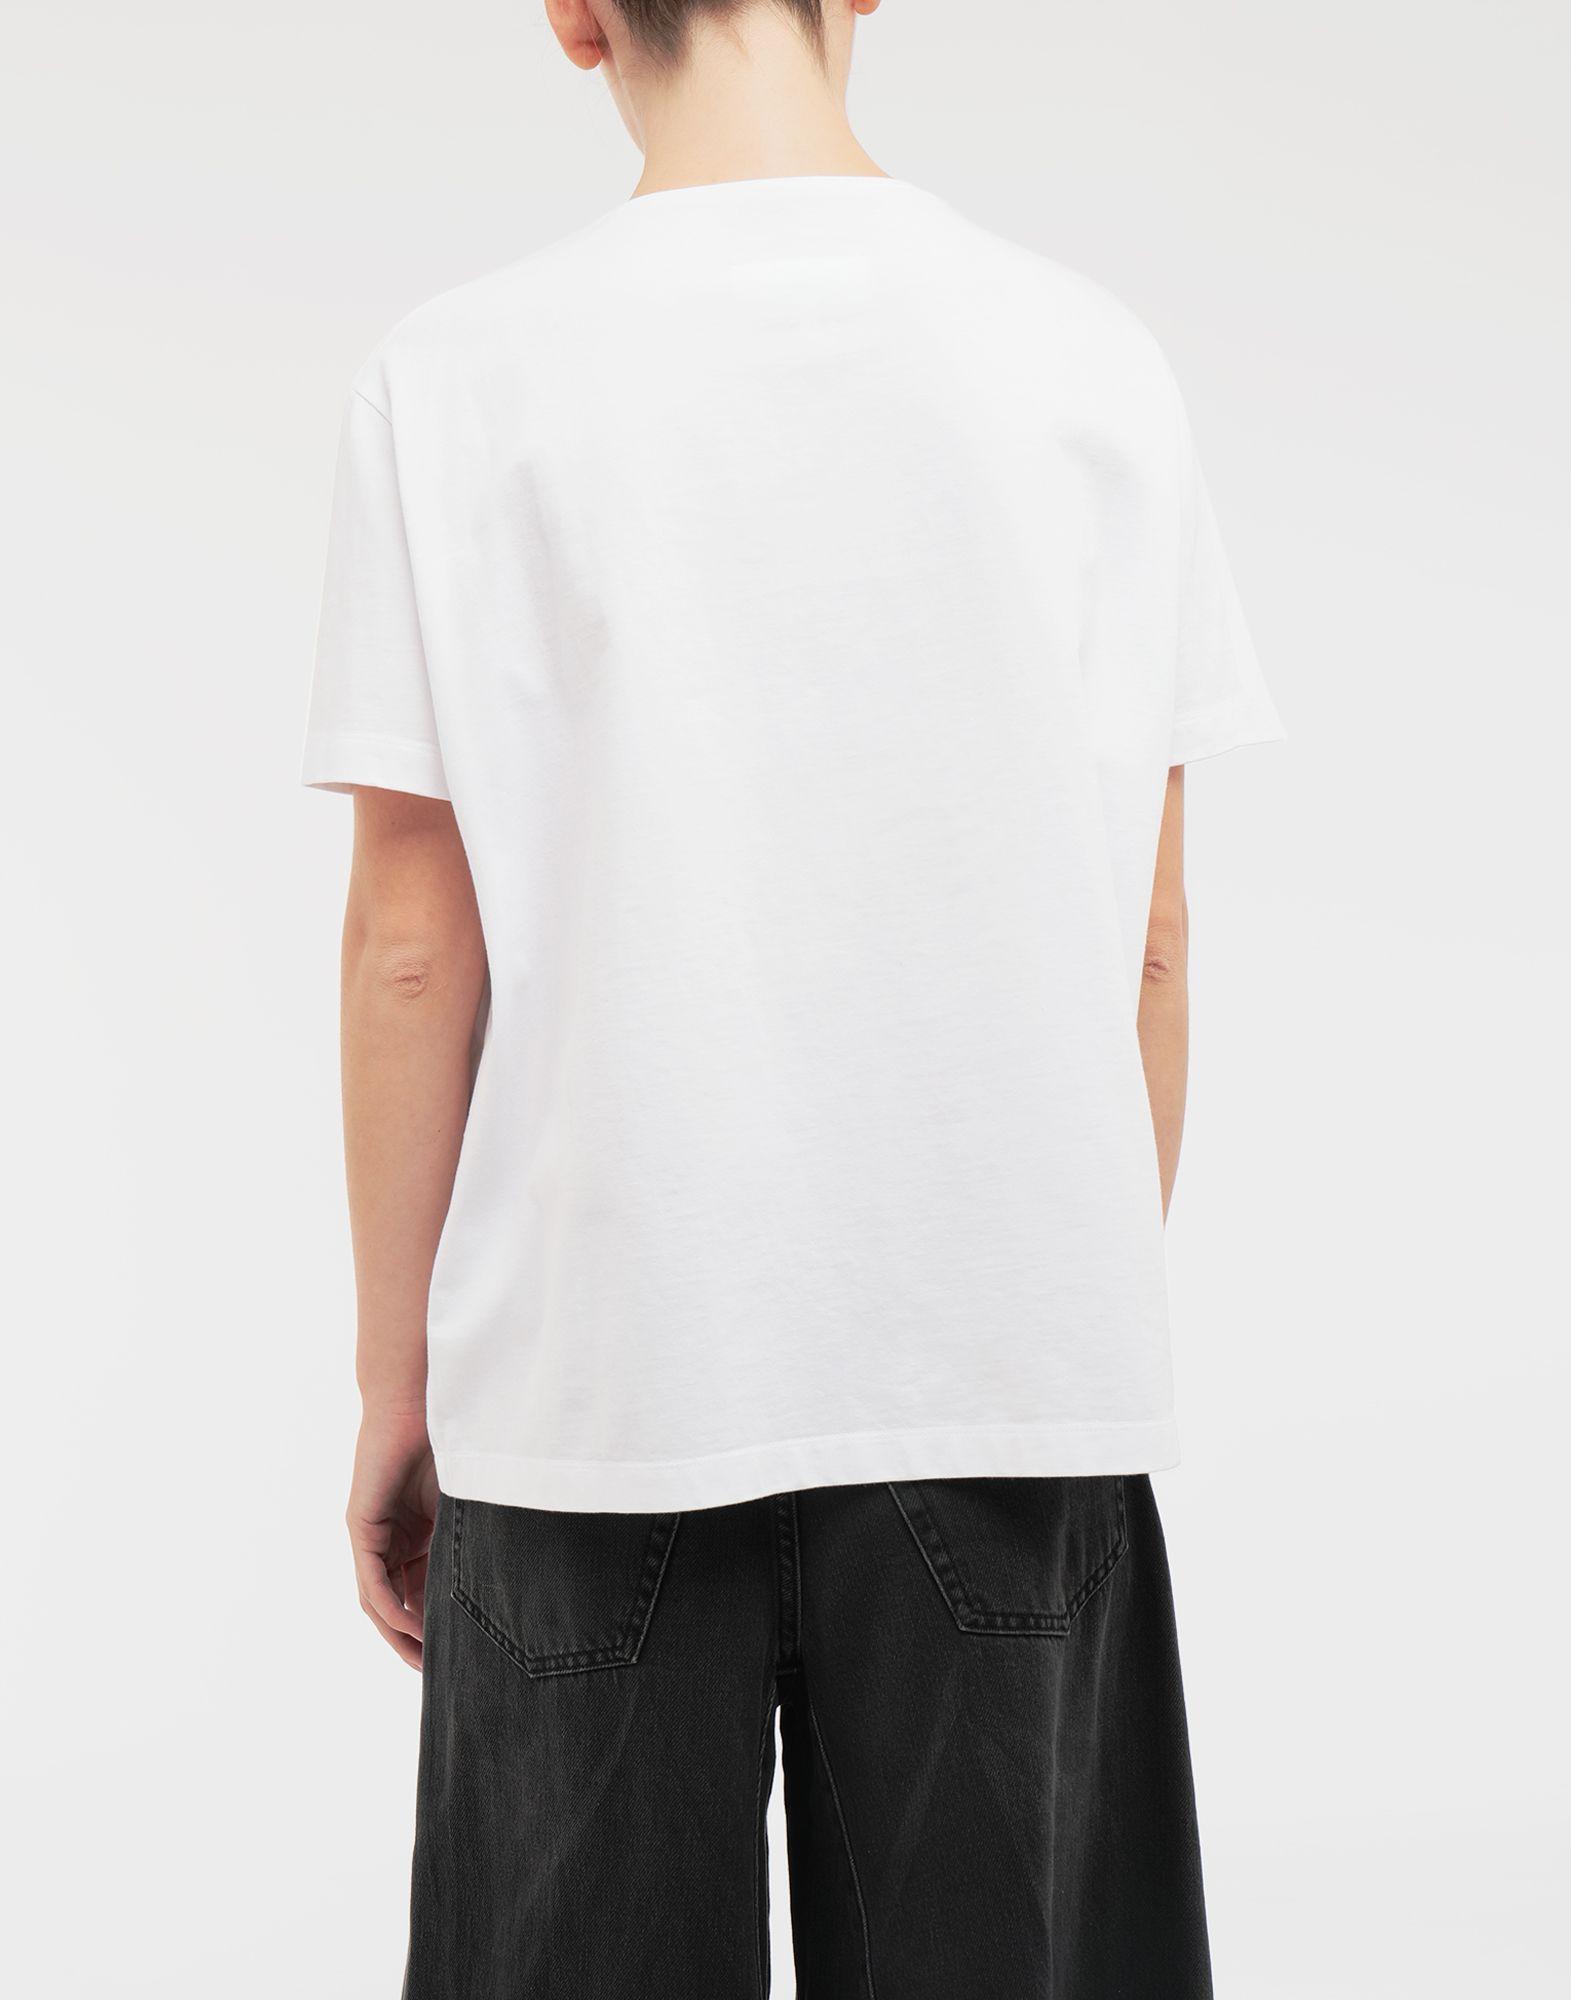 MM6 MAISON MARGIELA Colouring book print T-shirt Short sleeve t-shirt Woman e